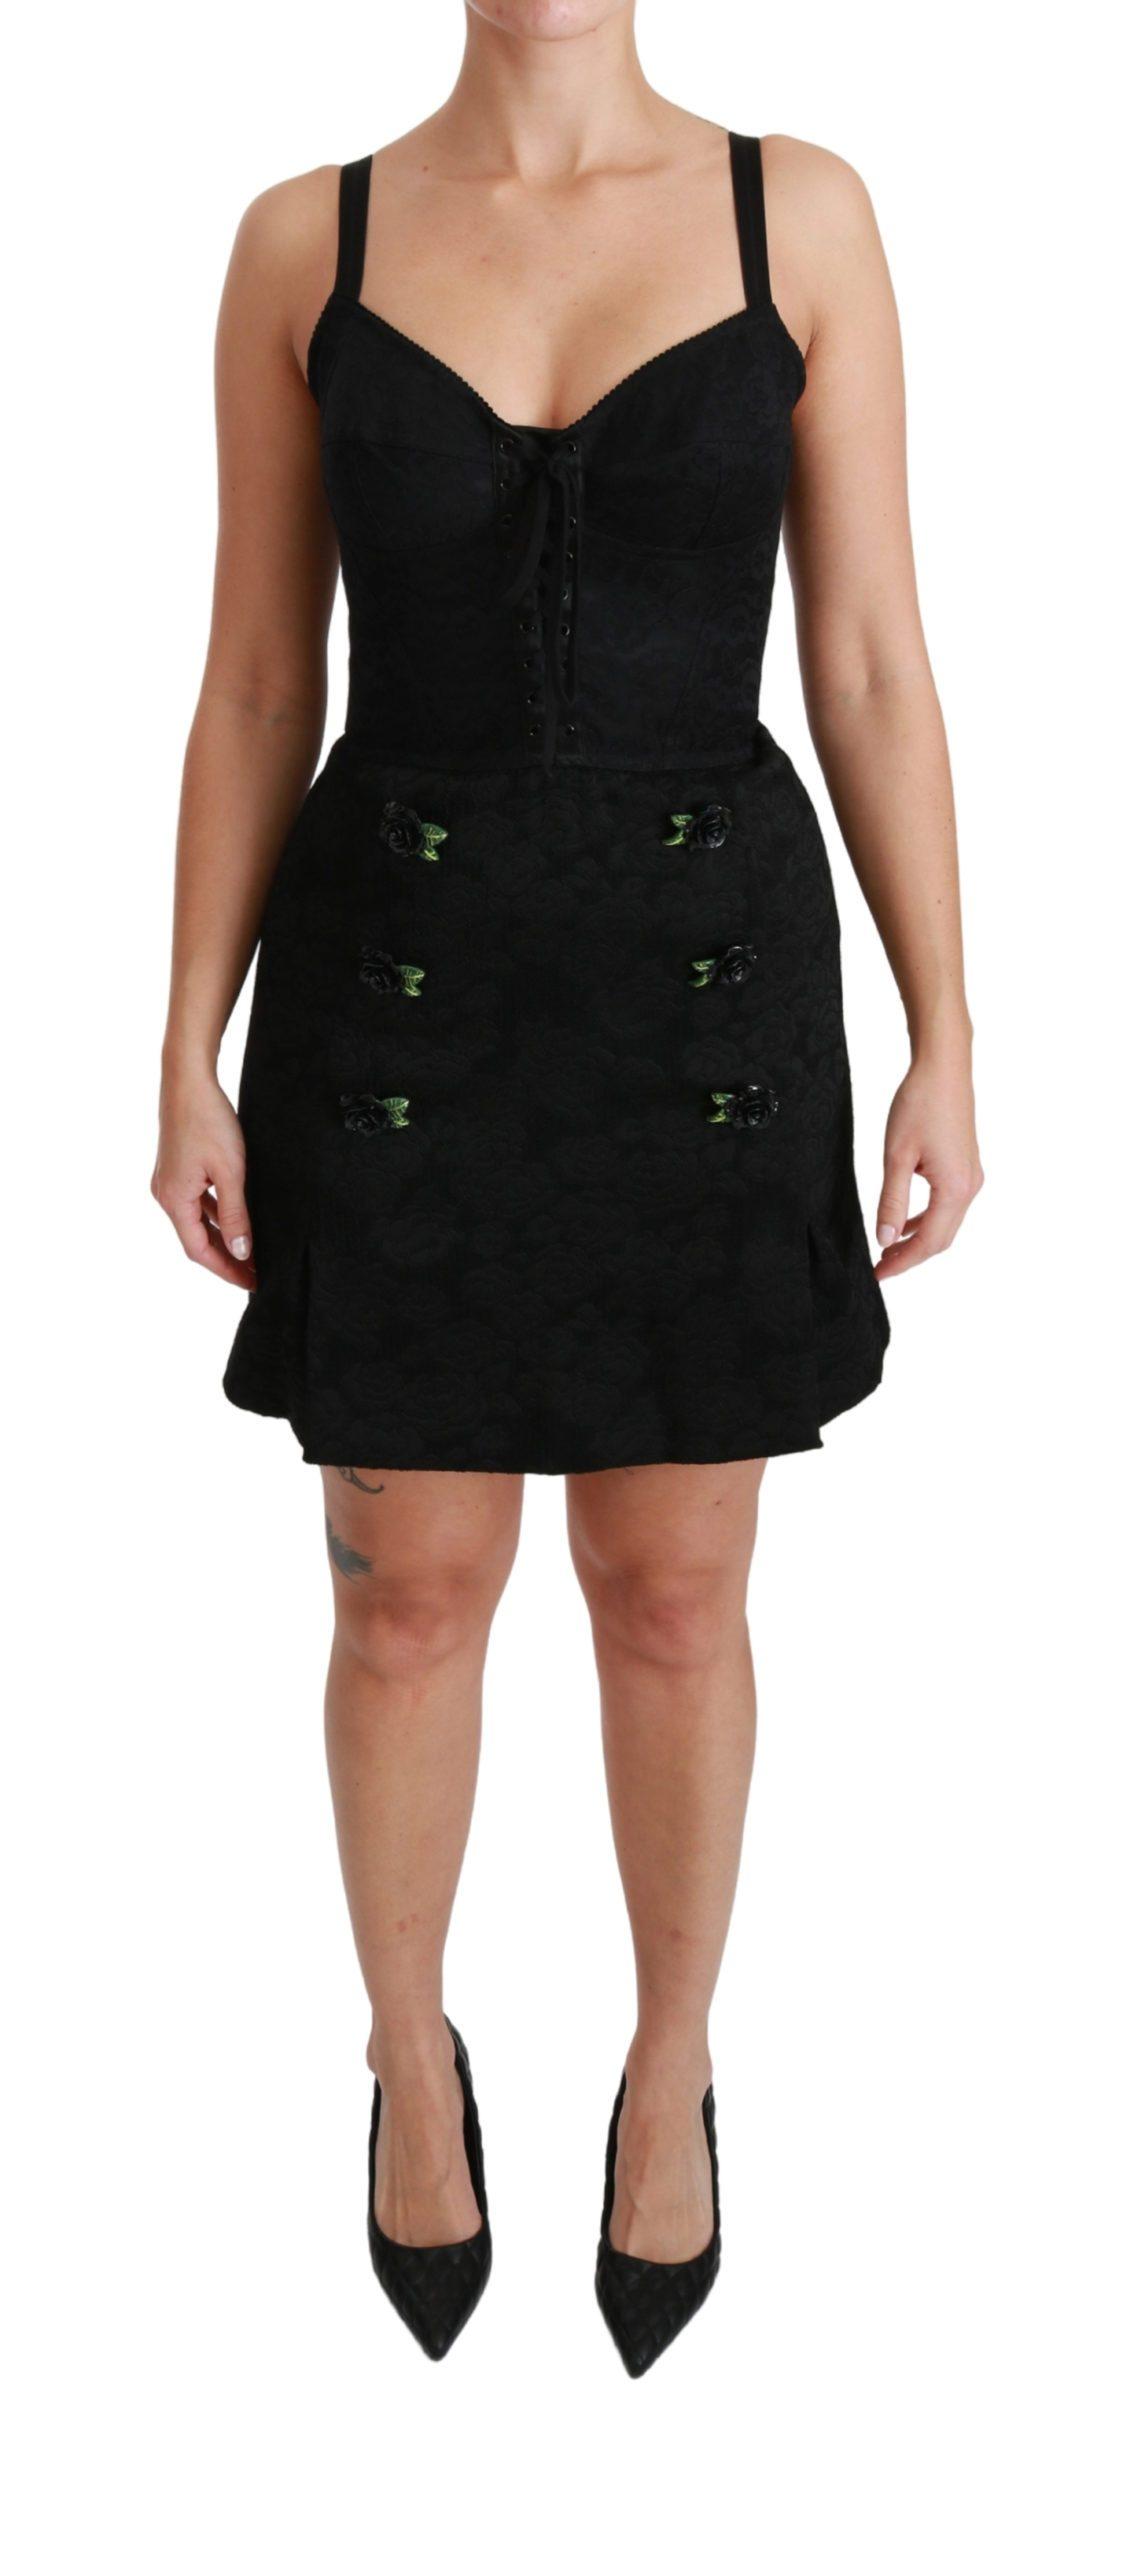 Dolce & Gabbana Women's Jacquard Corset Bustier Roses Dress Black DR2488 - IT40 S